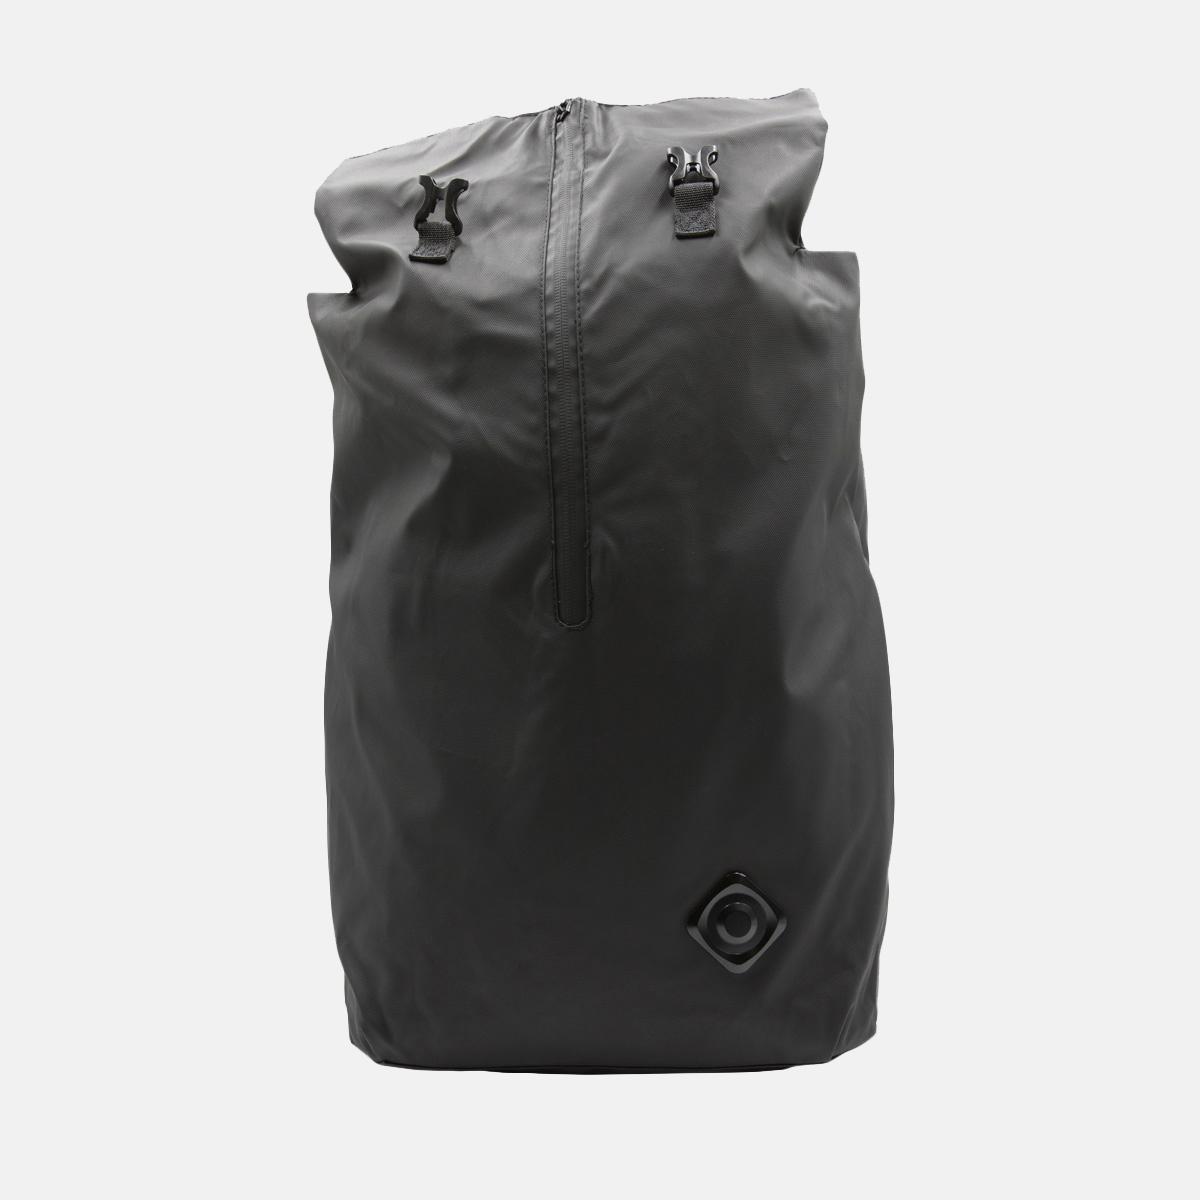 CARACA BLACK/BLACK UNISEX'S